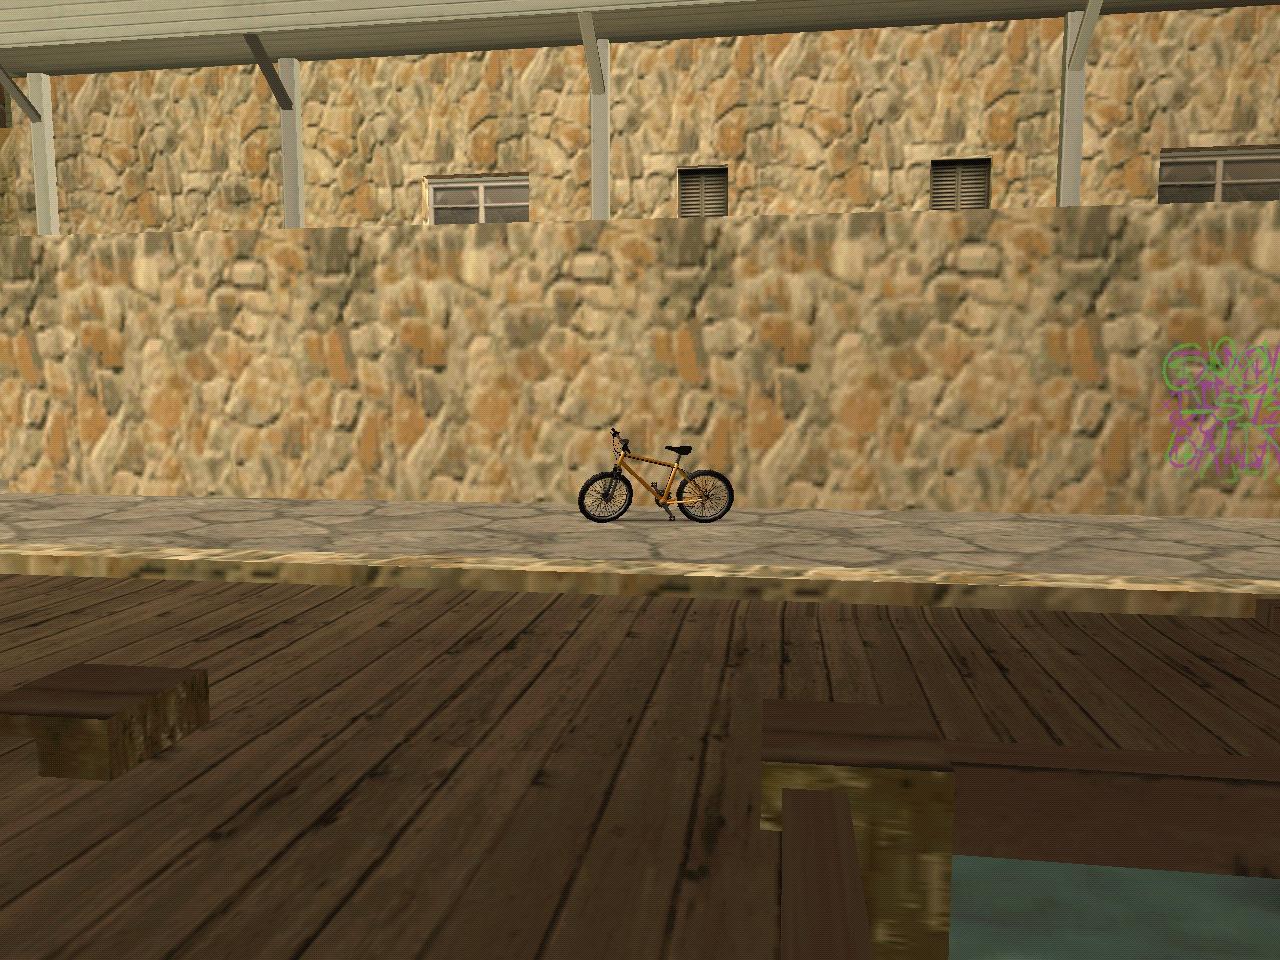 games_1 - Grand Theft Auto: San Andreas